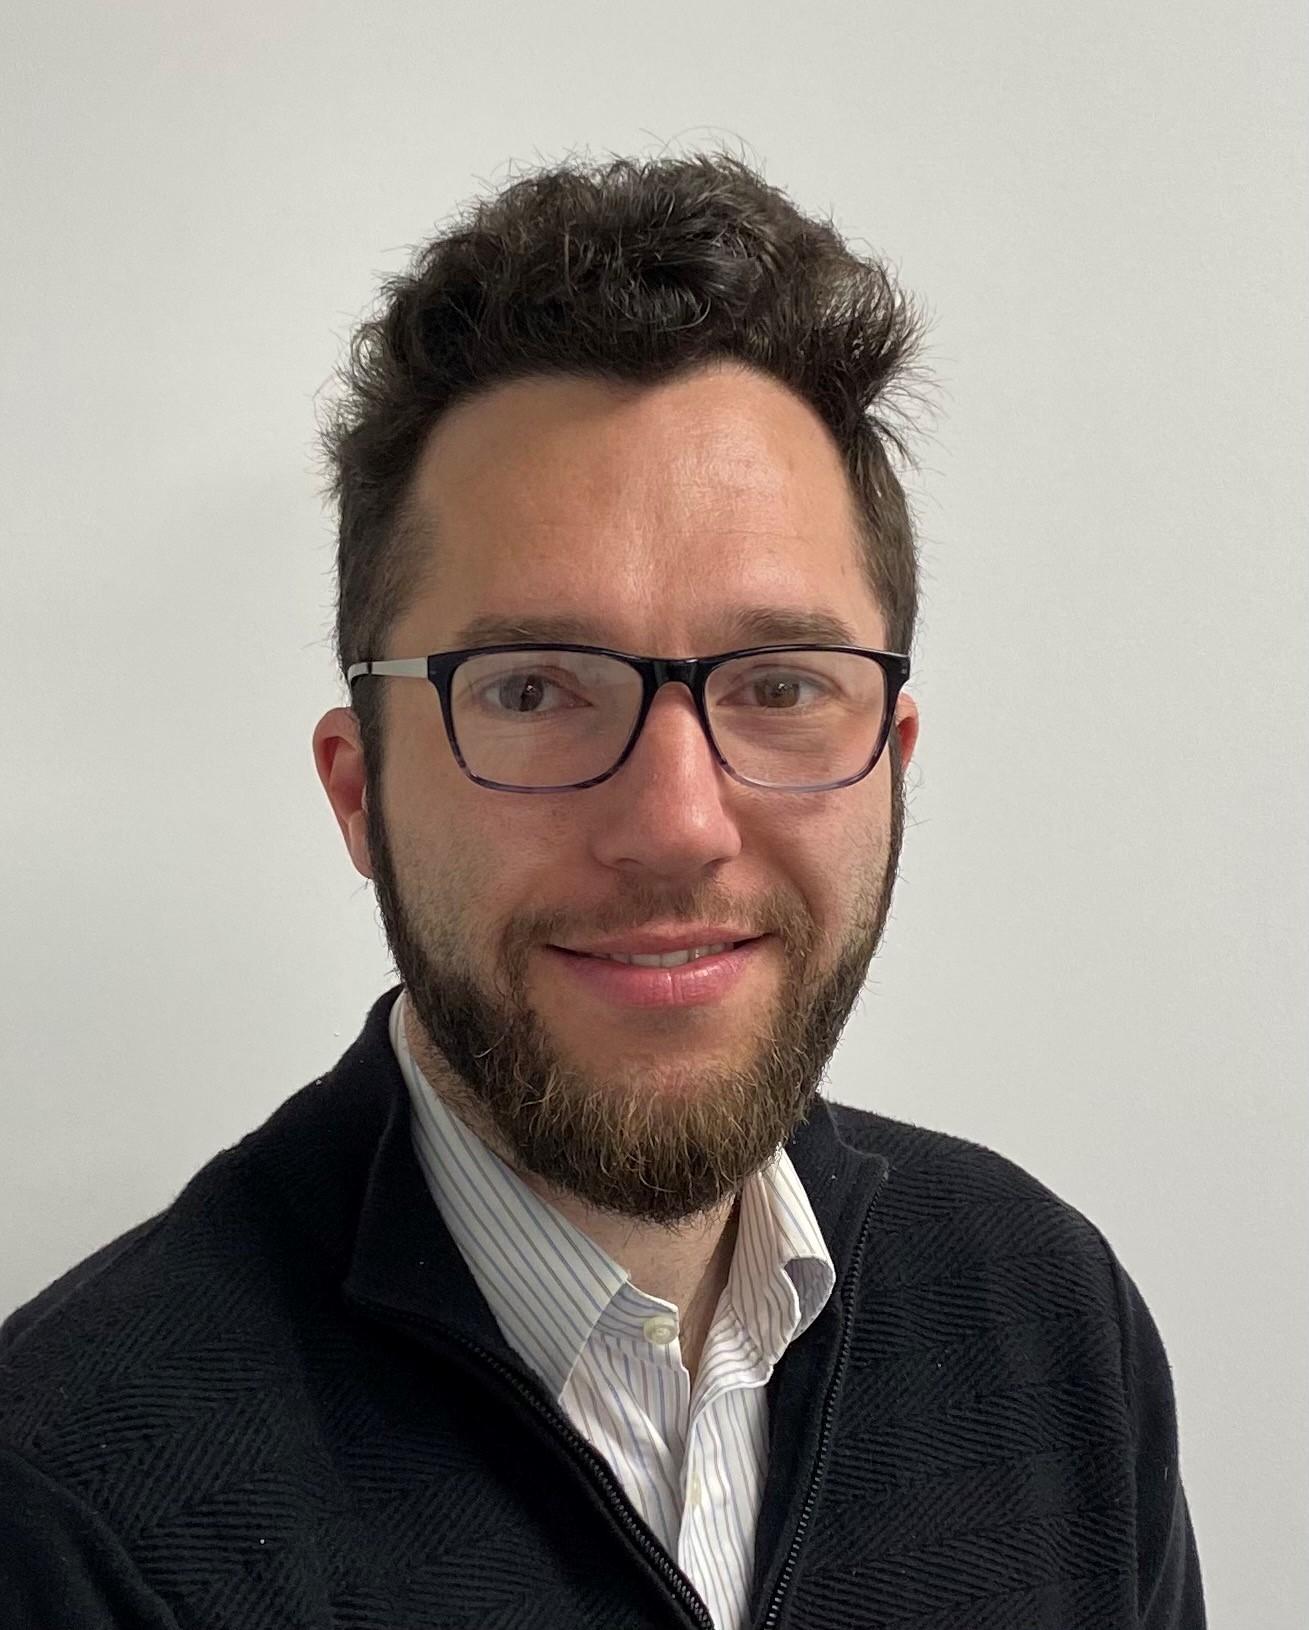 Sales Engineer - Nathan Tate